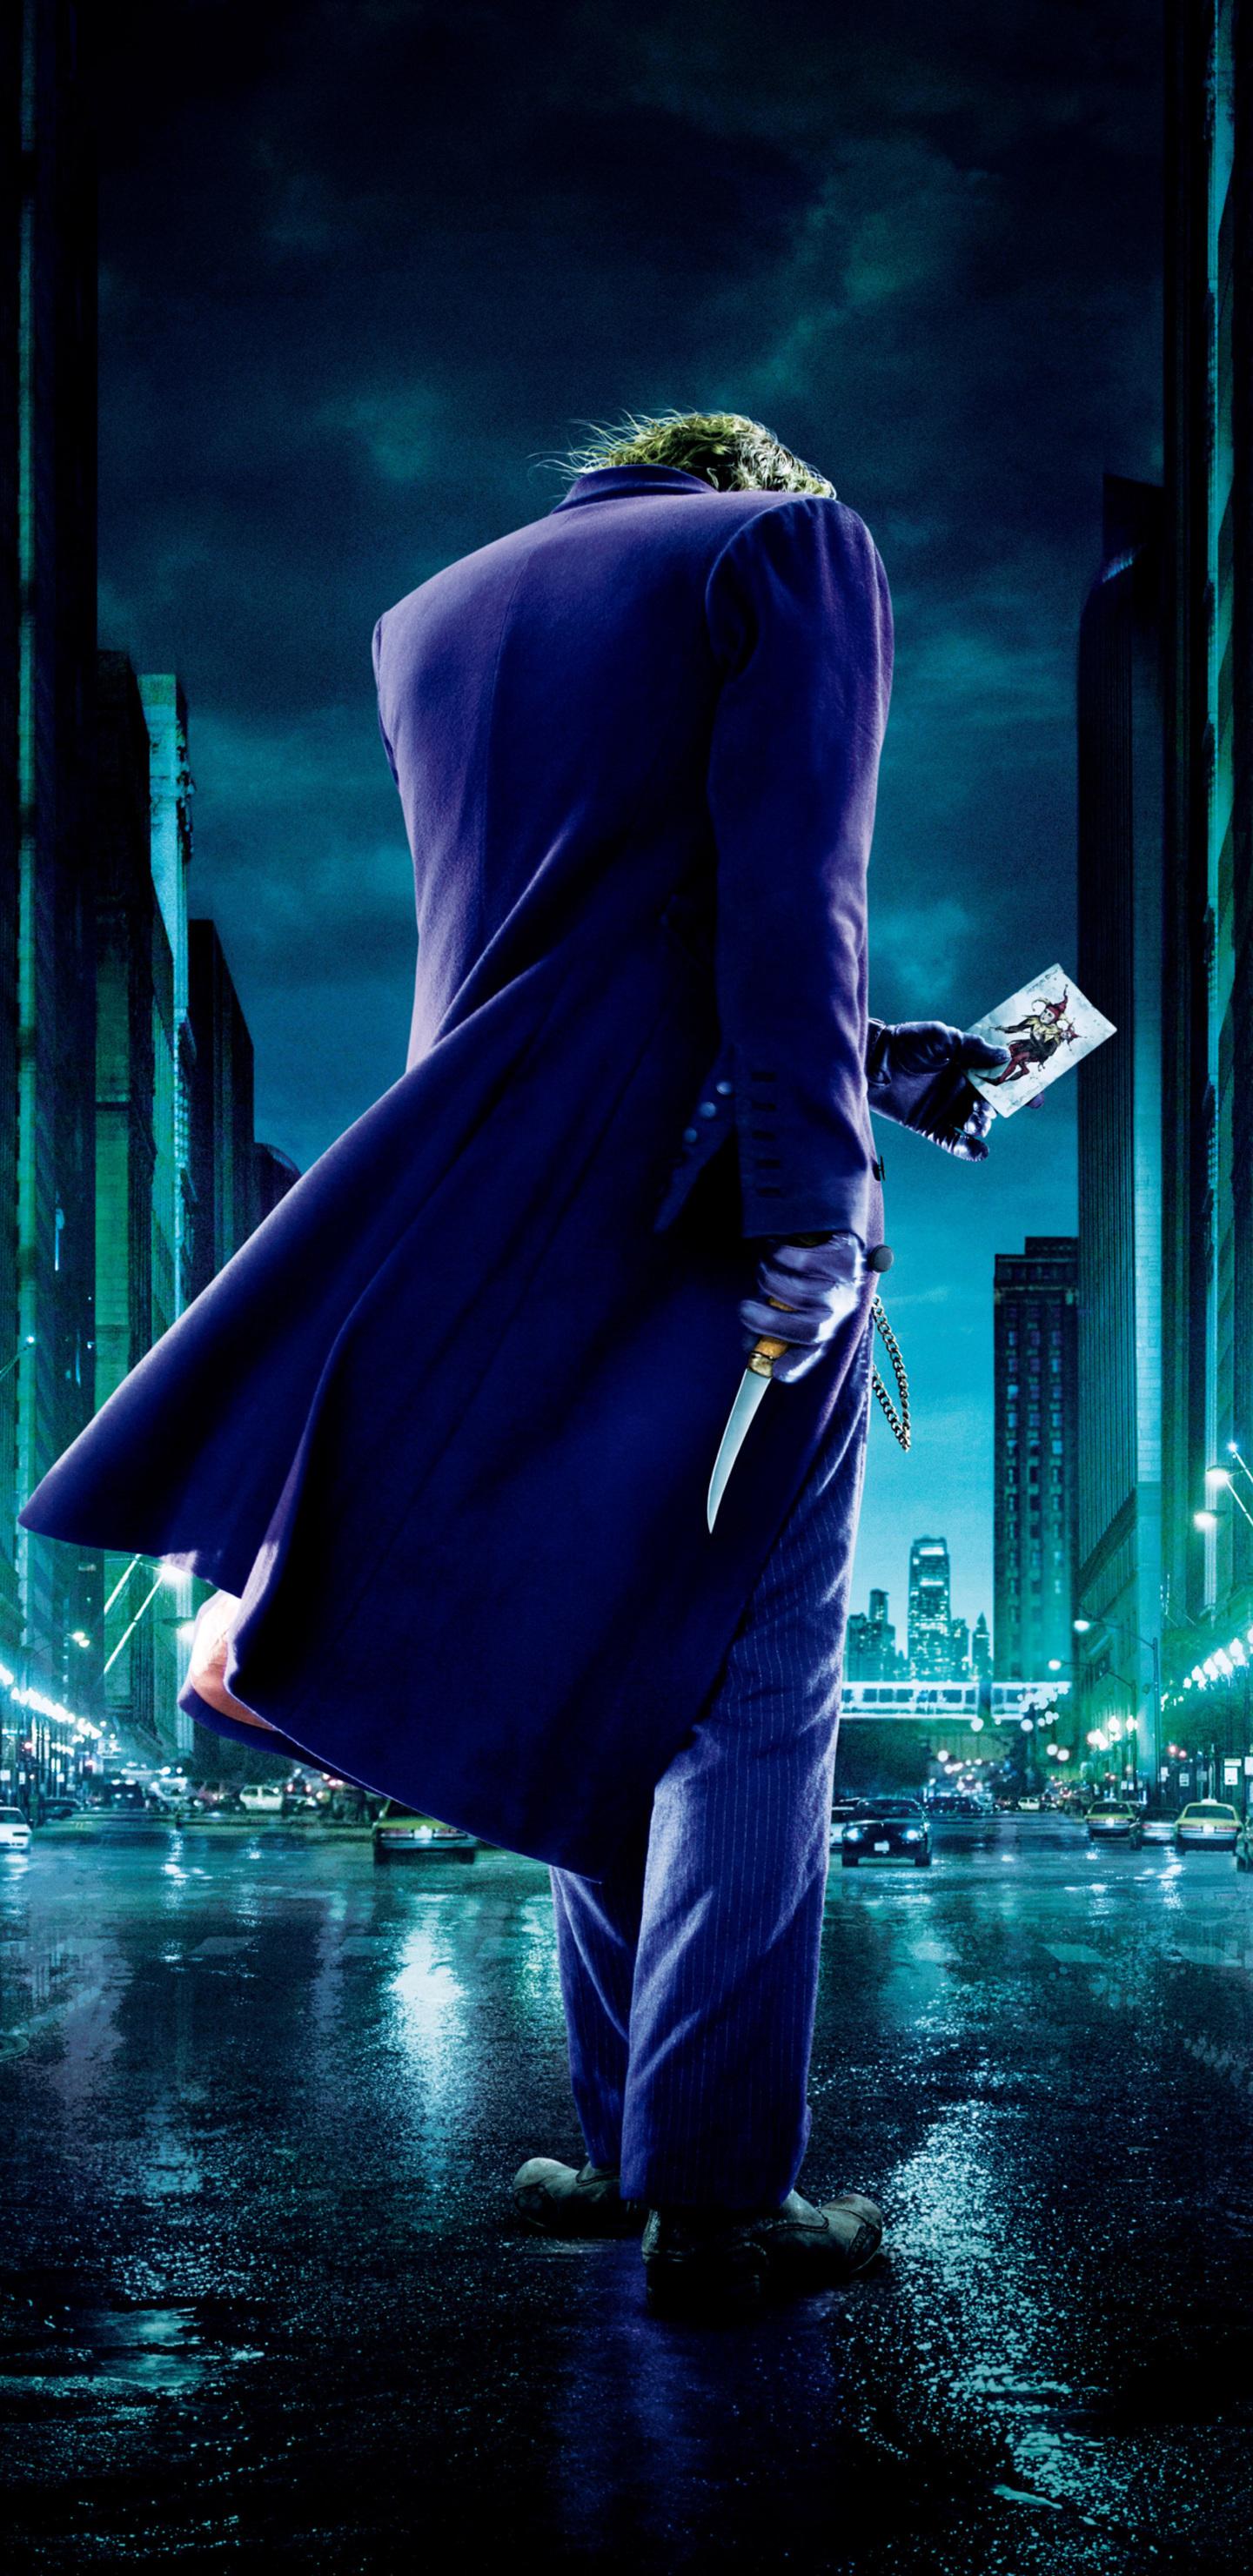 1440x2960 Joker The Dark Knight 4k Samsung Galaxy Note 9,8 ...